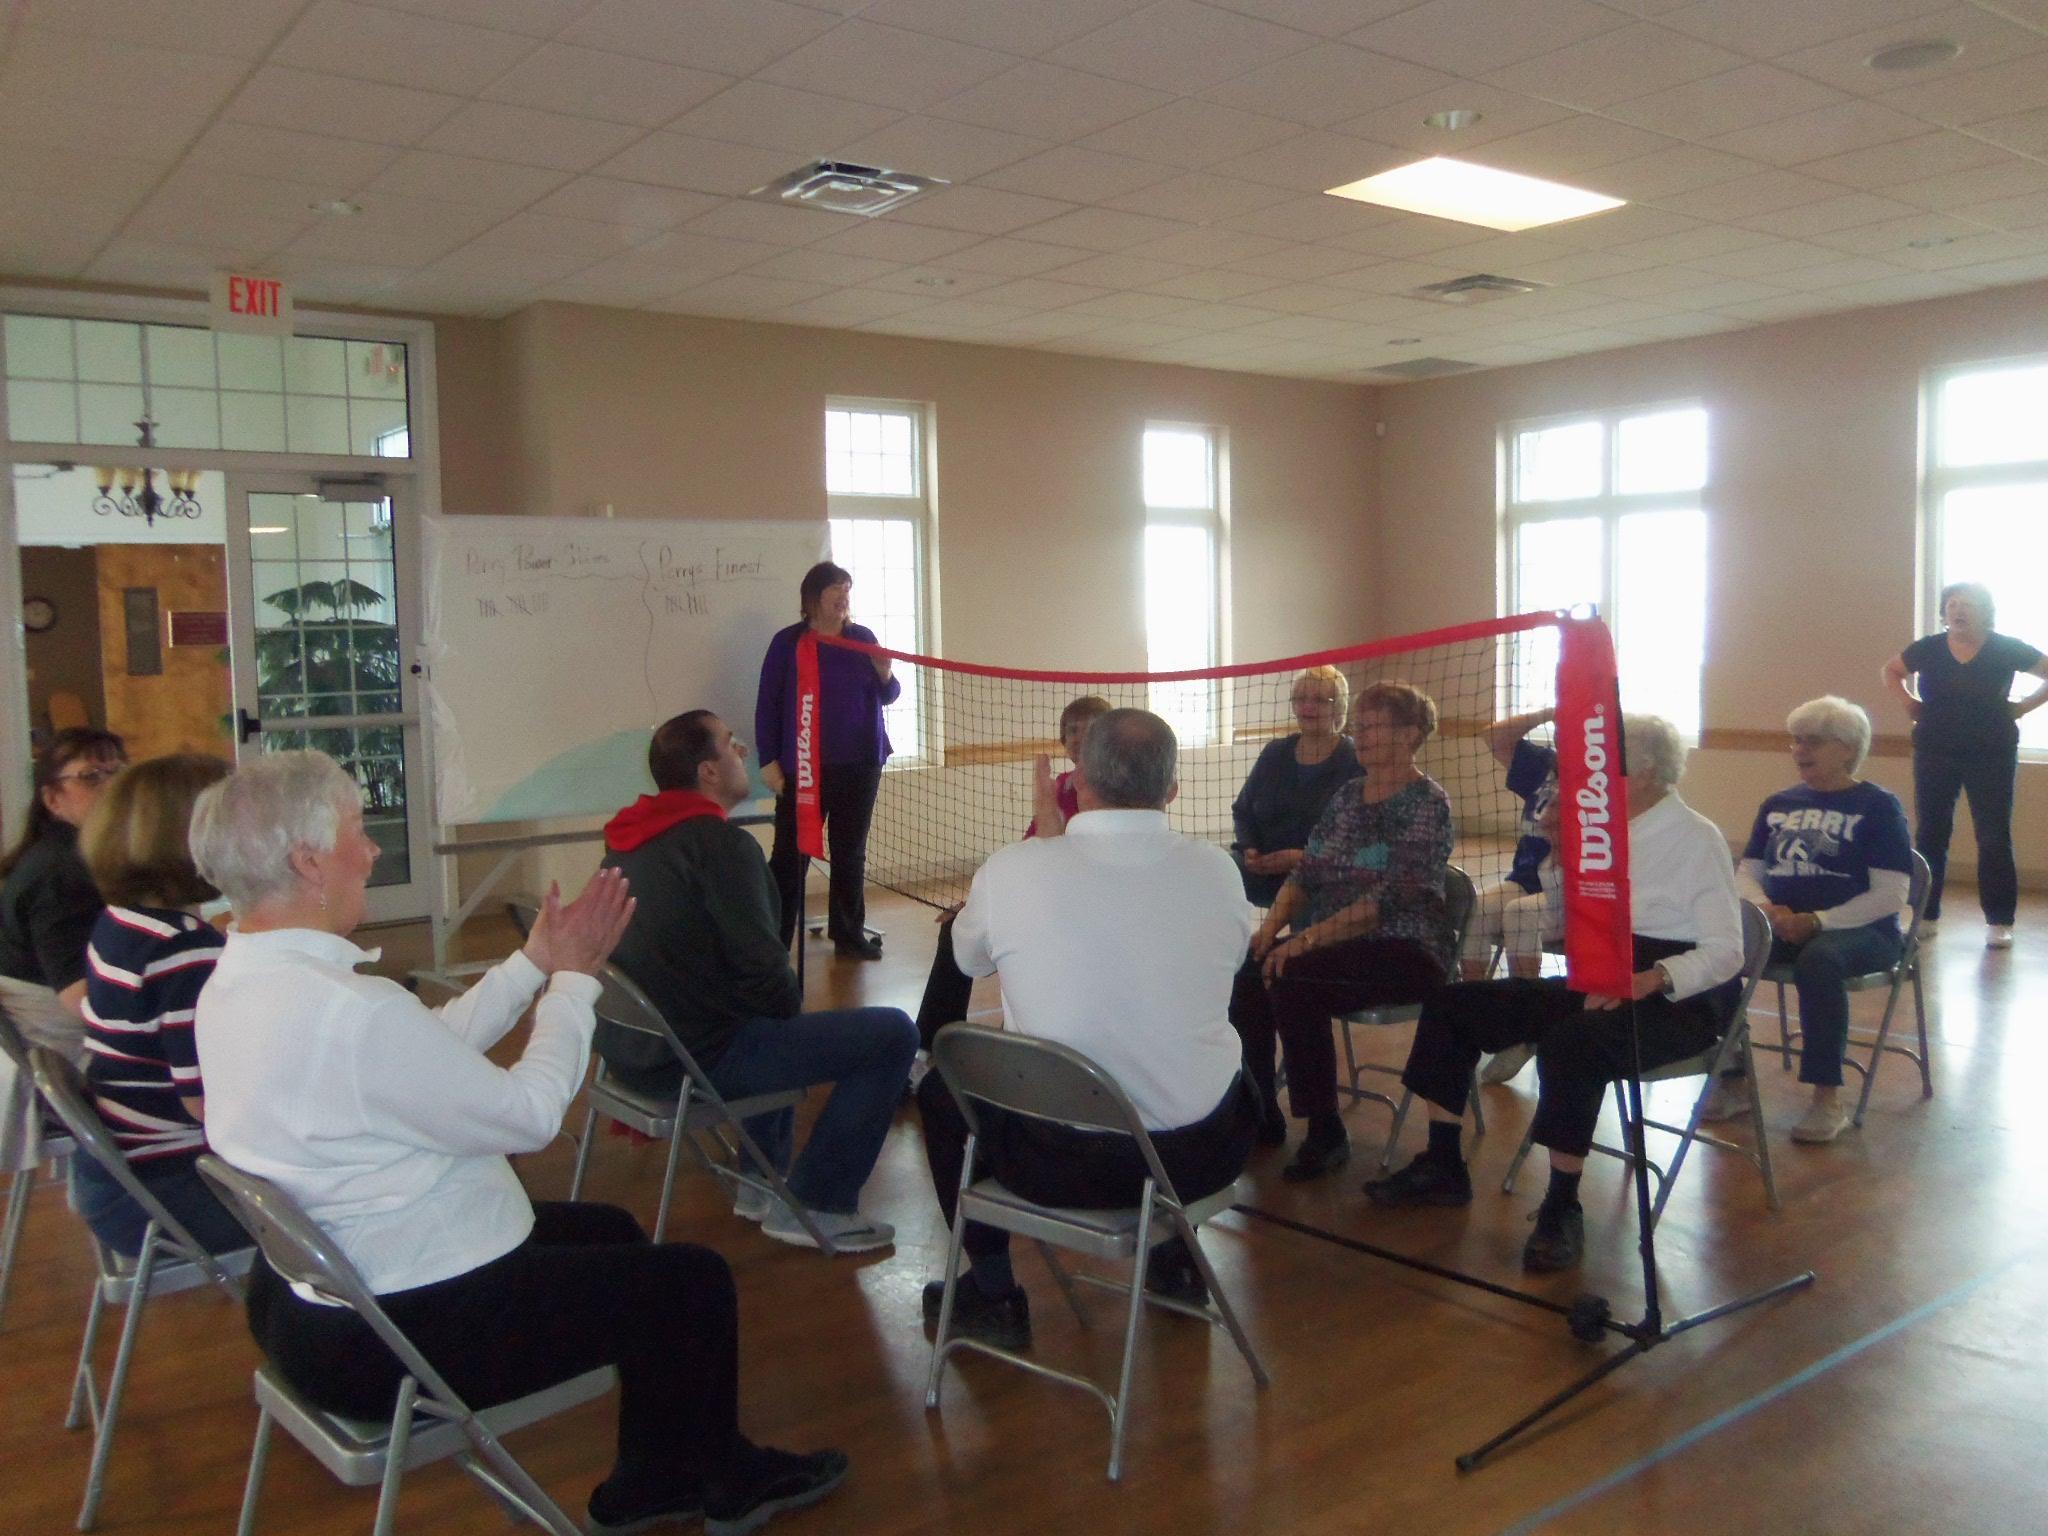 wheelchair volleyball v steam chair perry community senior center